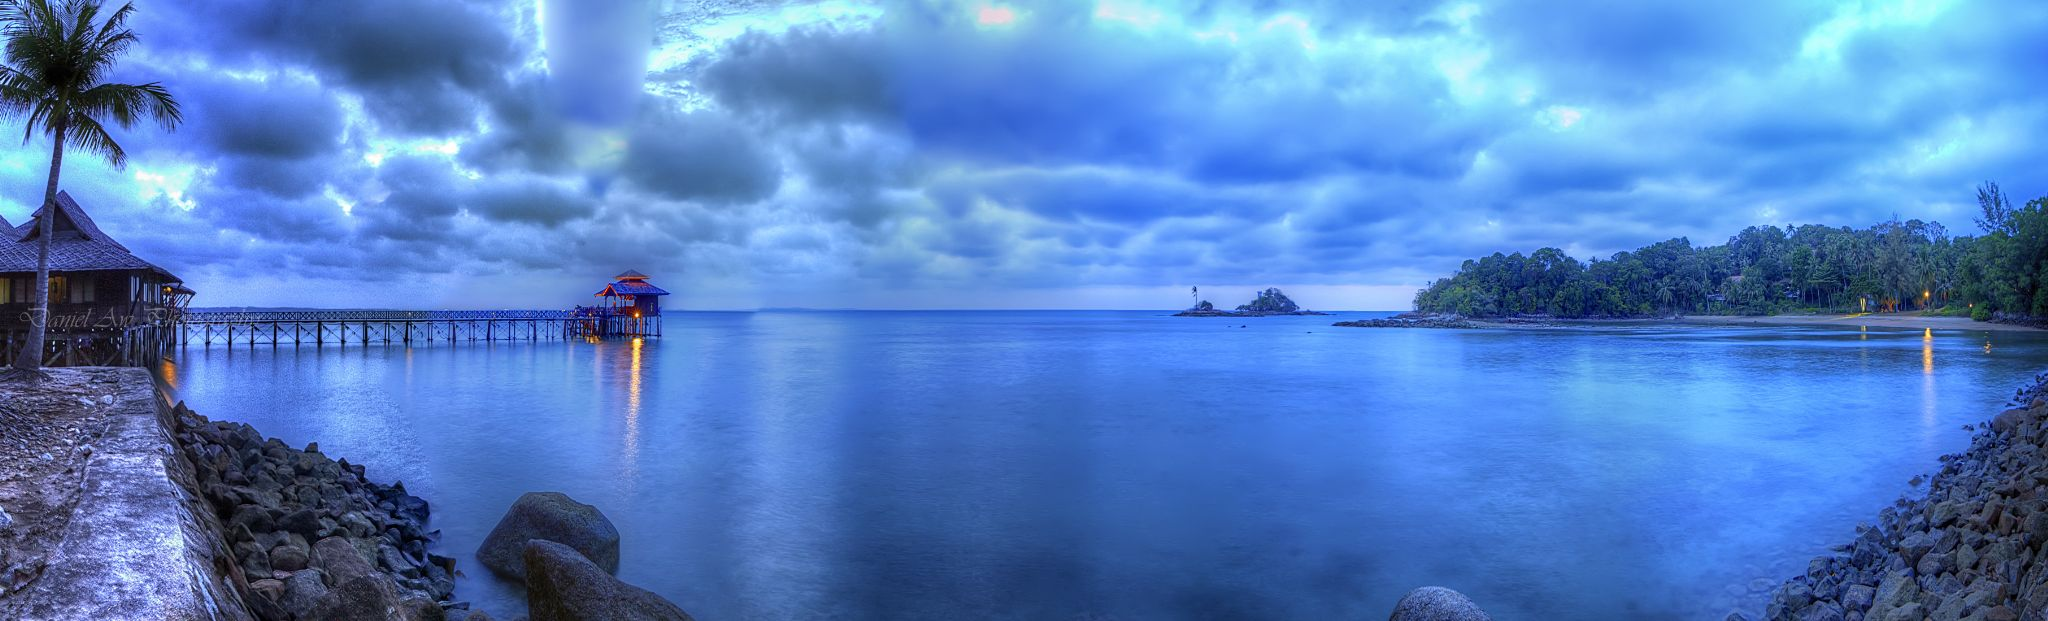 Blue Serenade by Daniel Aw